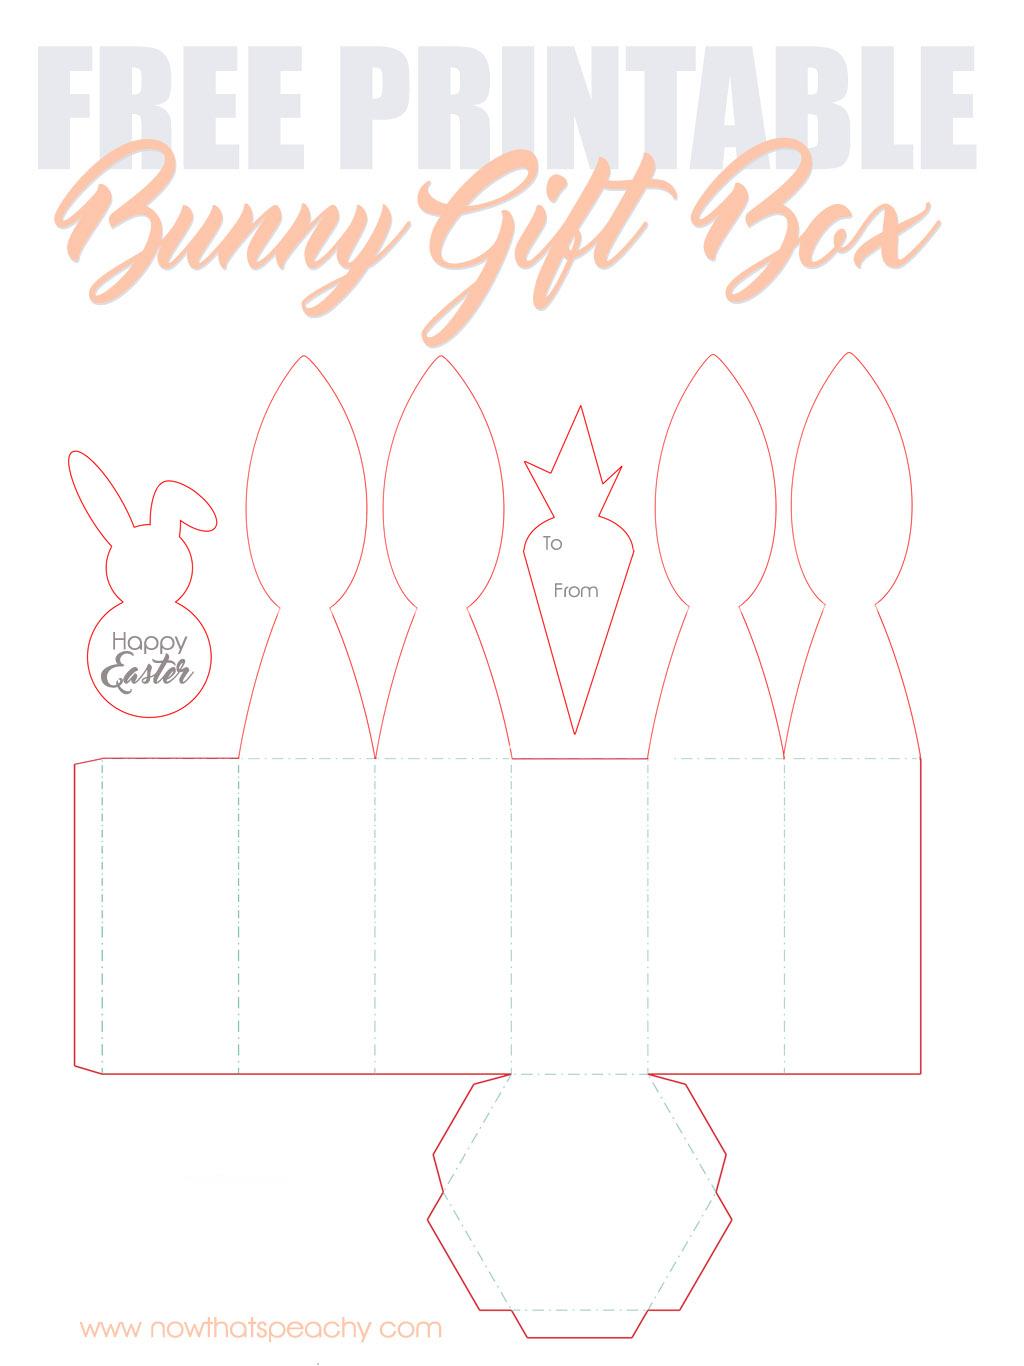 Free Bunny Ears Gift Box Printable For Easter | Now Thats Peachy - Free Printable Bunny Templates